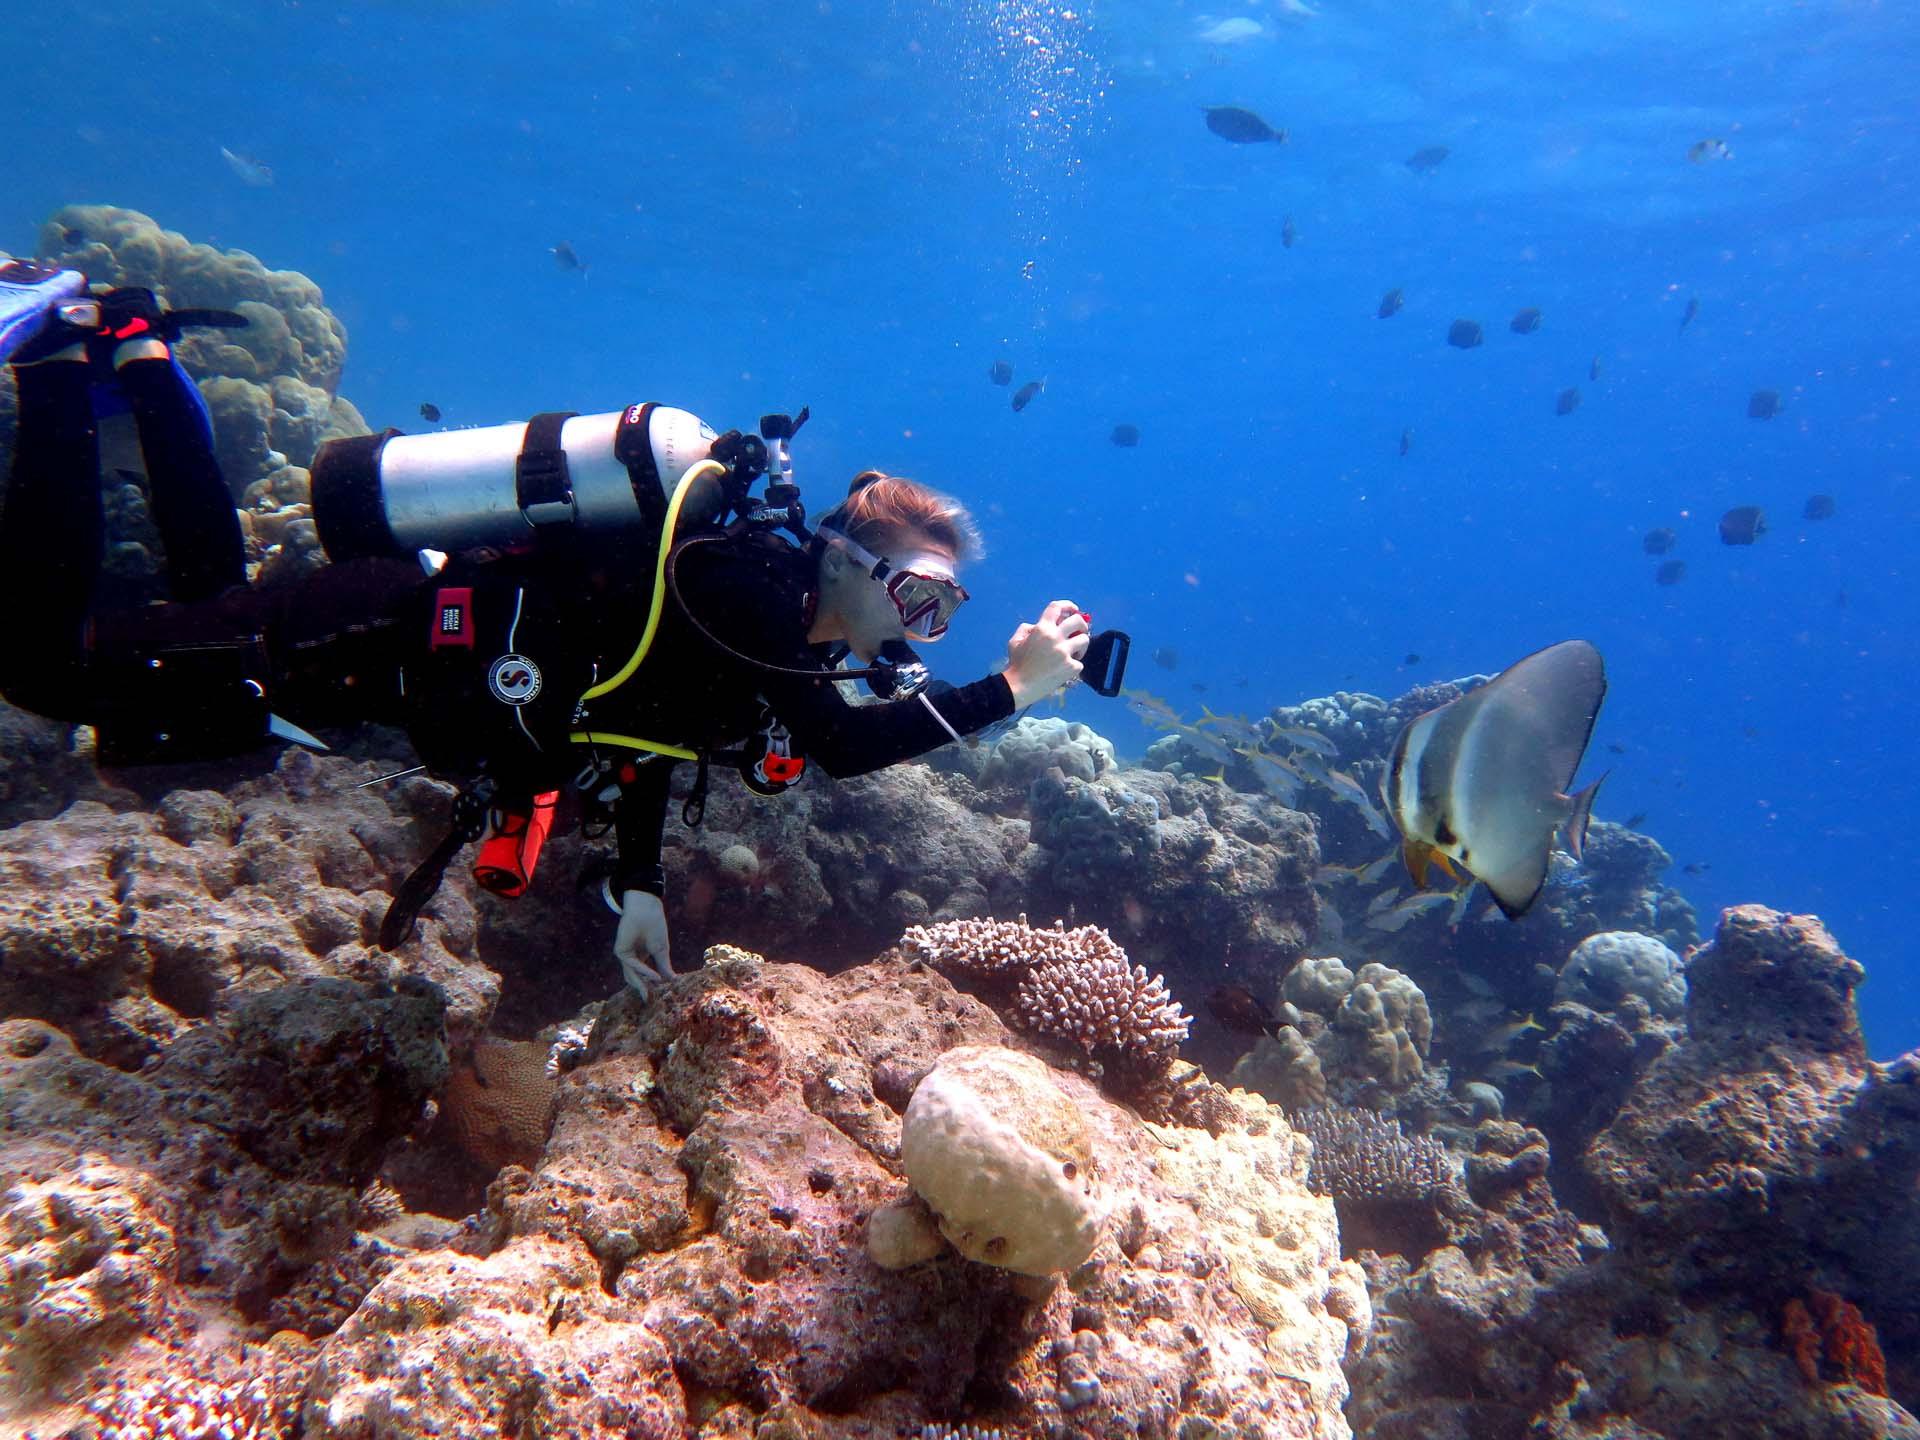 Seamarc Maldives Volunteering - wonderful natural coral reef